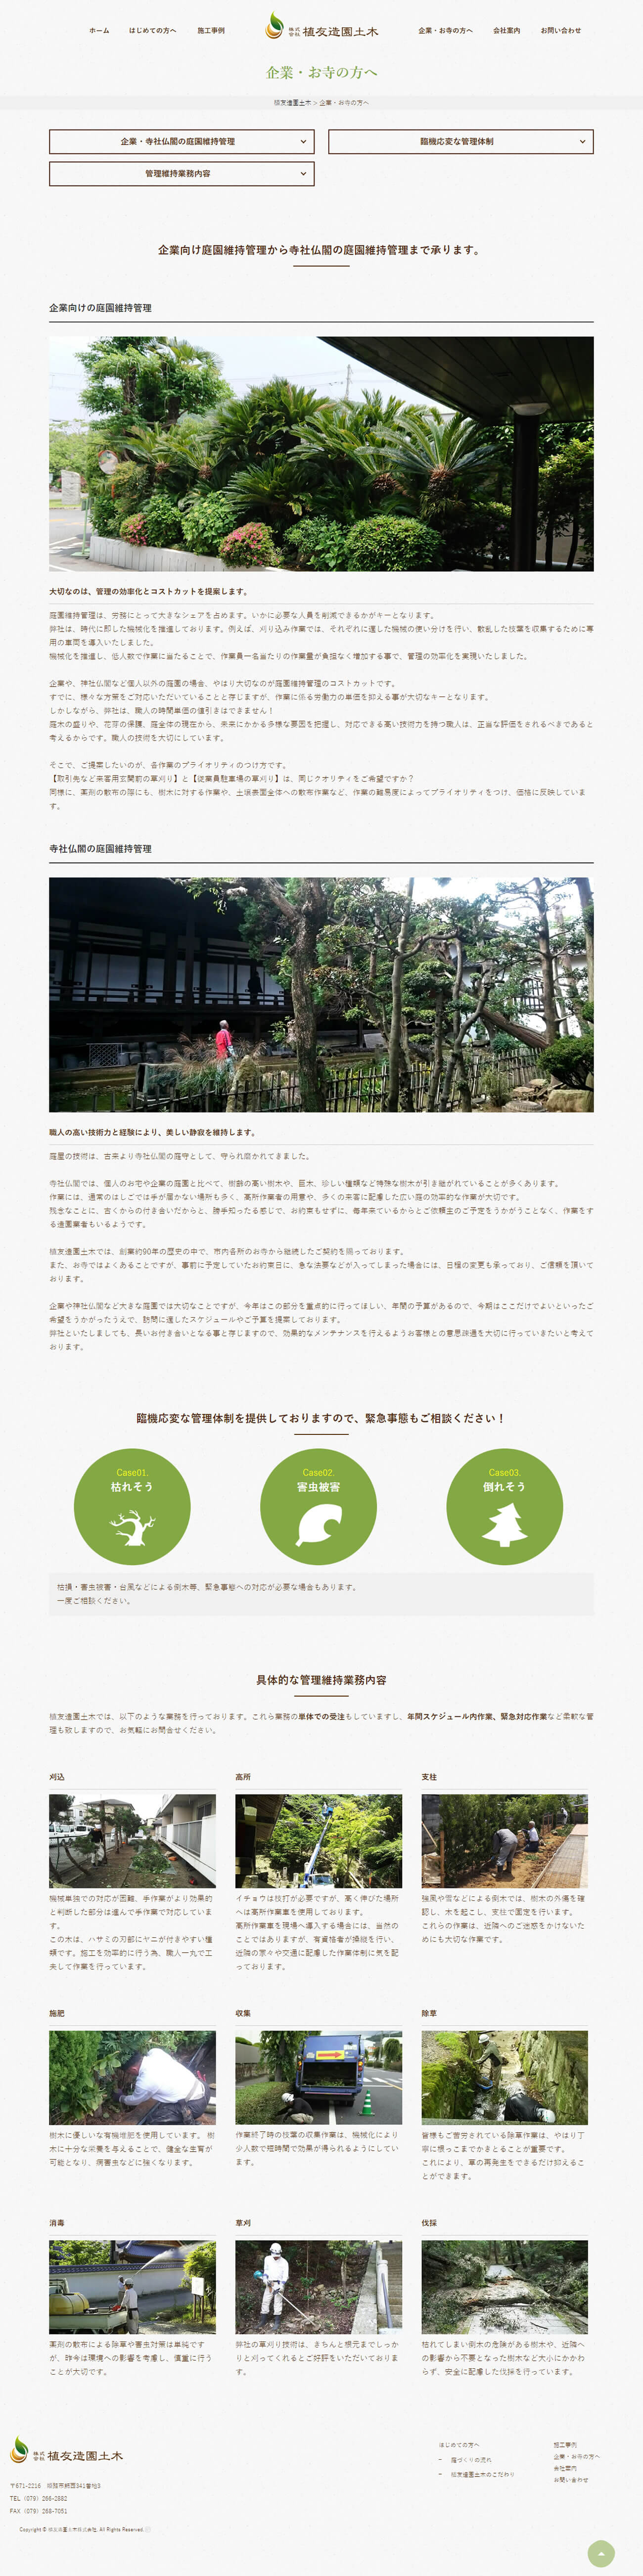 姫路市 株式会社植友造園土木 ホームページ制作2